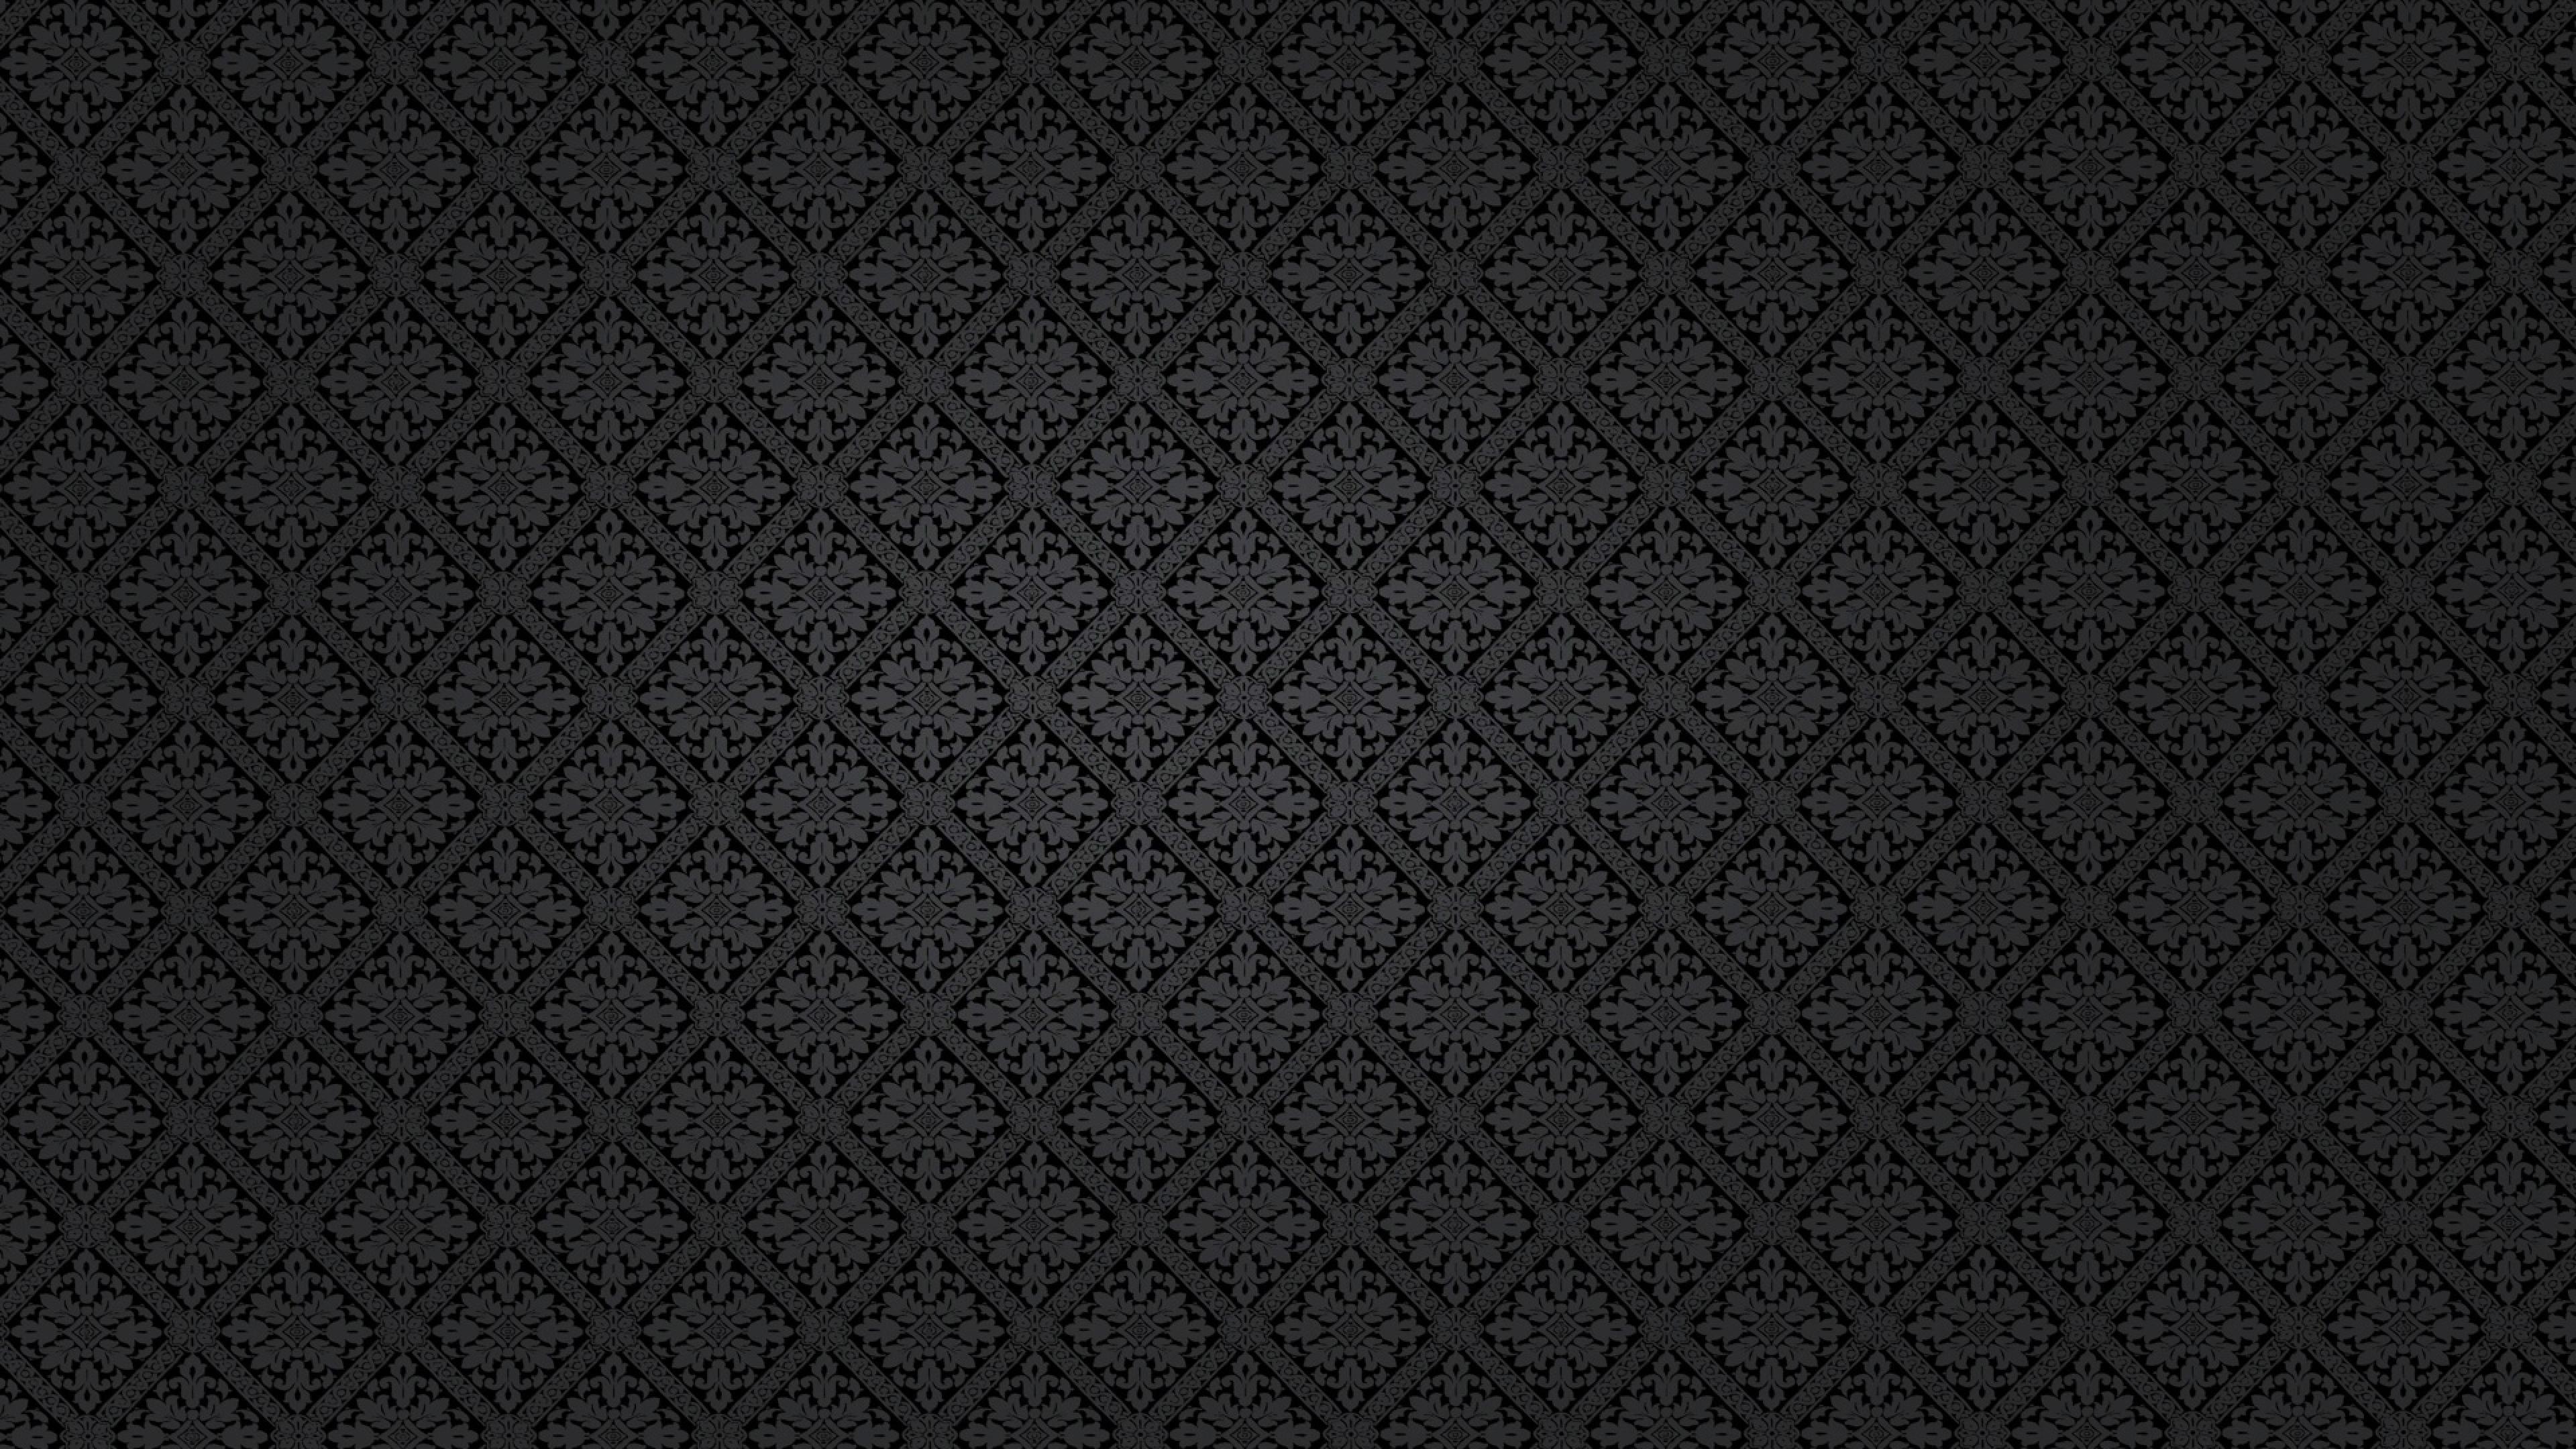 Download Wallpaper 3840x2160 Texture Wall Colors Patterns 4K Ultra 3840x2160